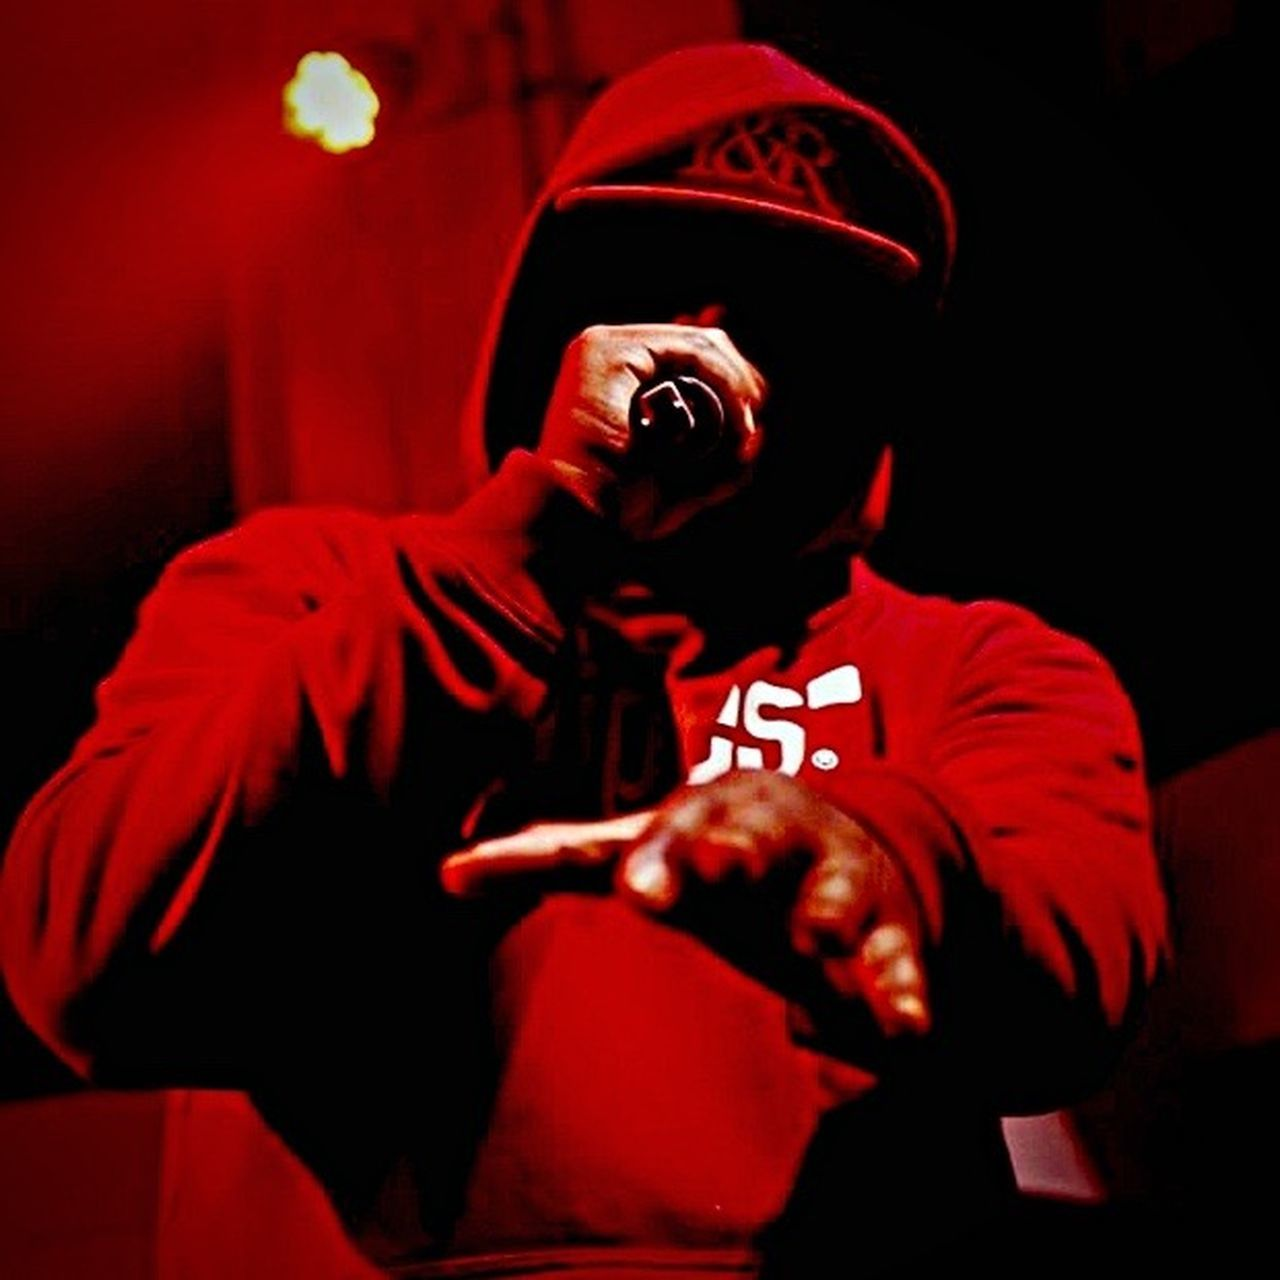 Ghostfacekillah Ghost Ghostface Ironman Tonystark Wutang Wutangclan HipHop Live Music Newyork Gig Music